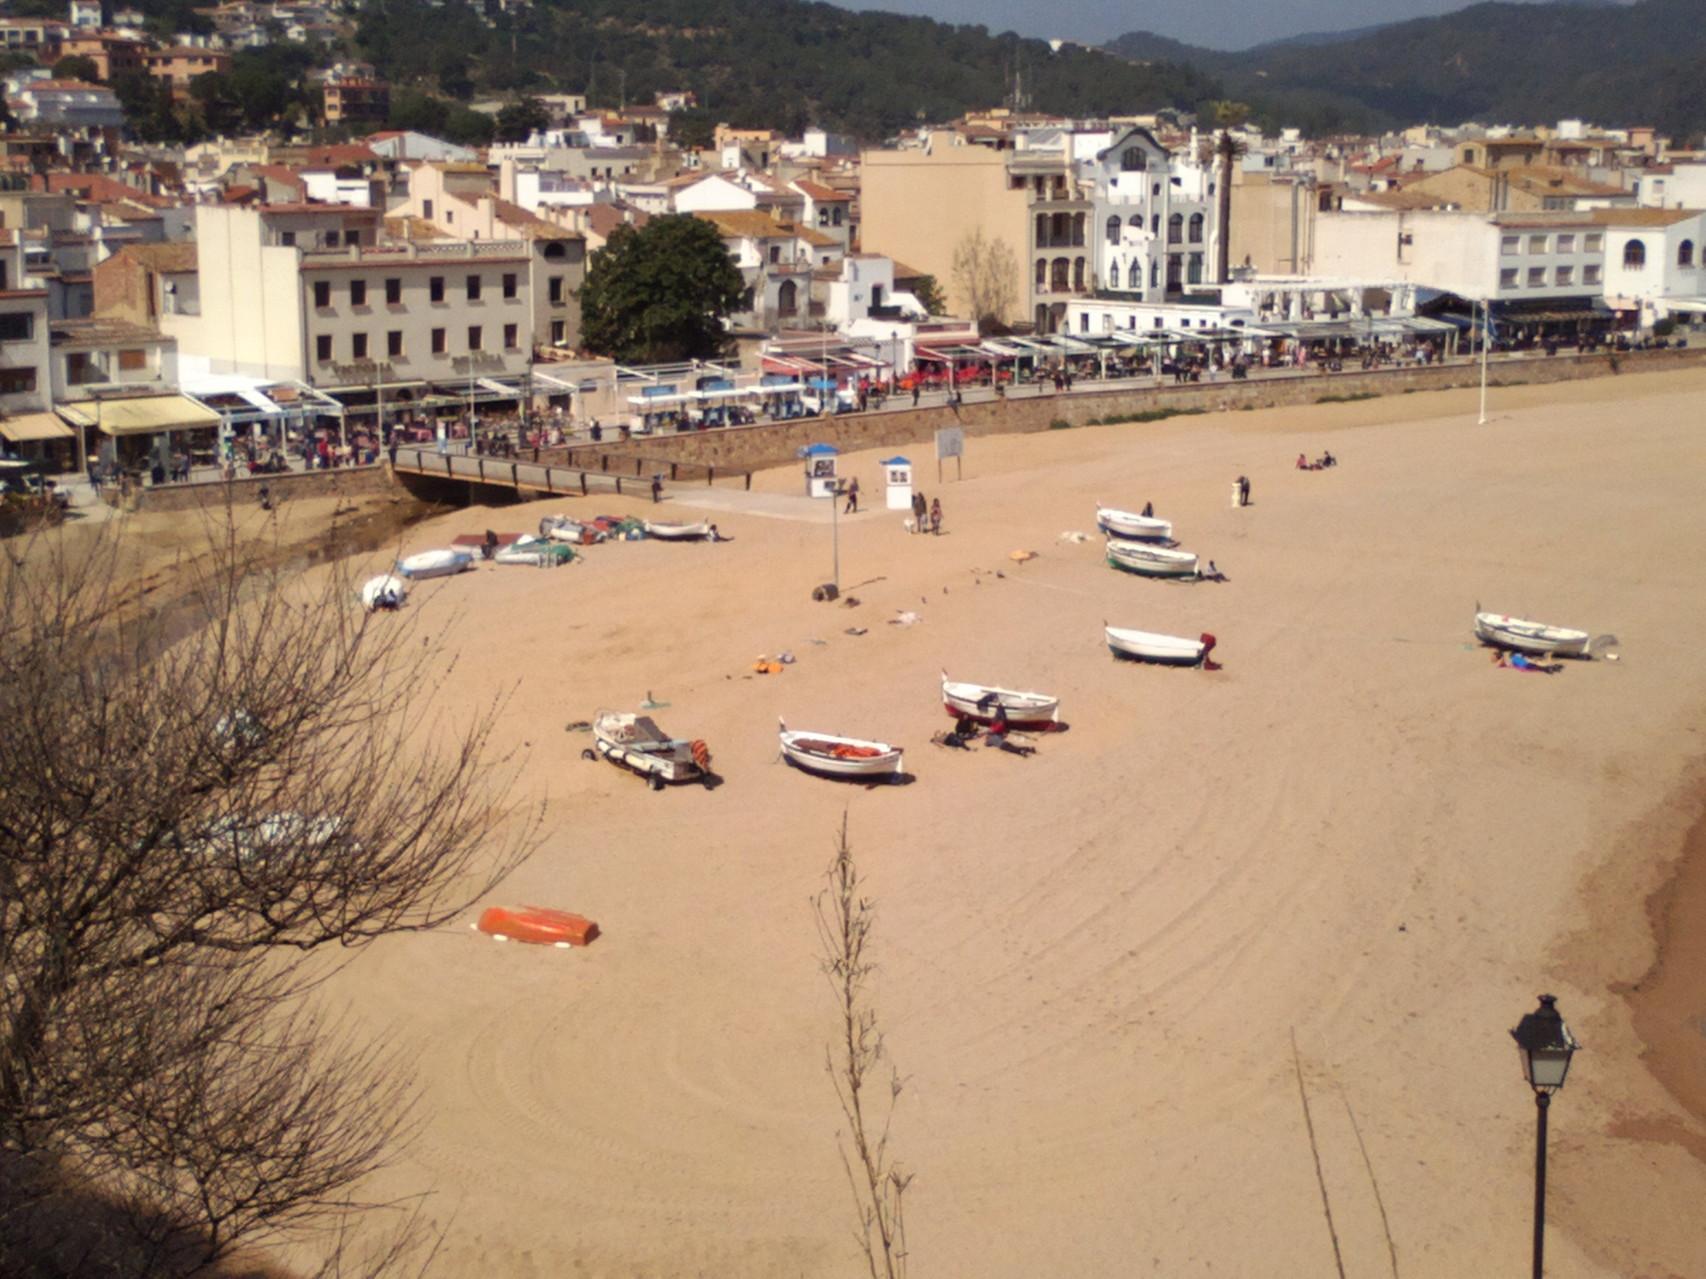 La playa gran